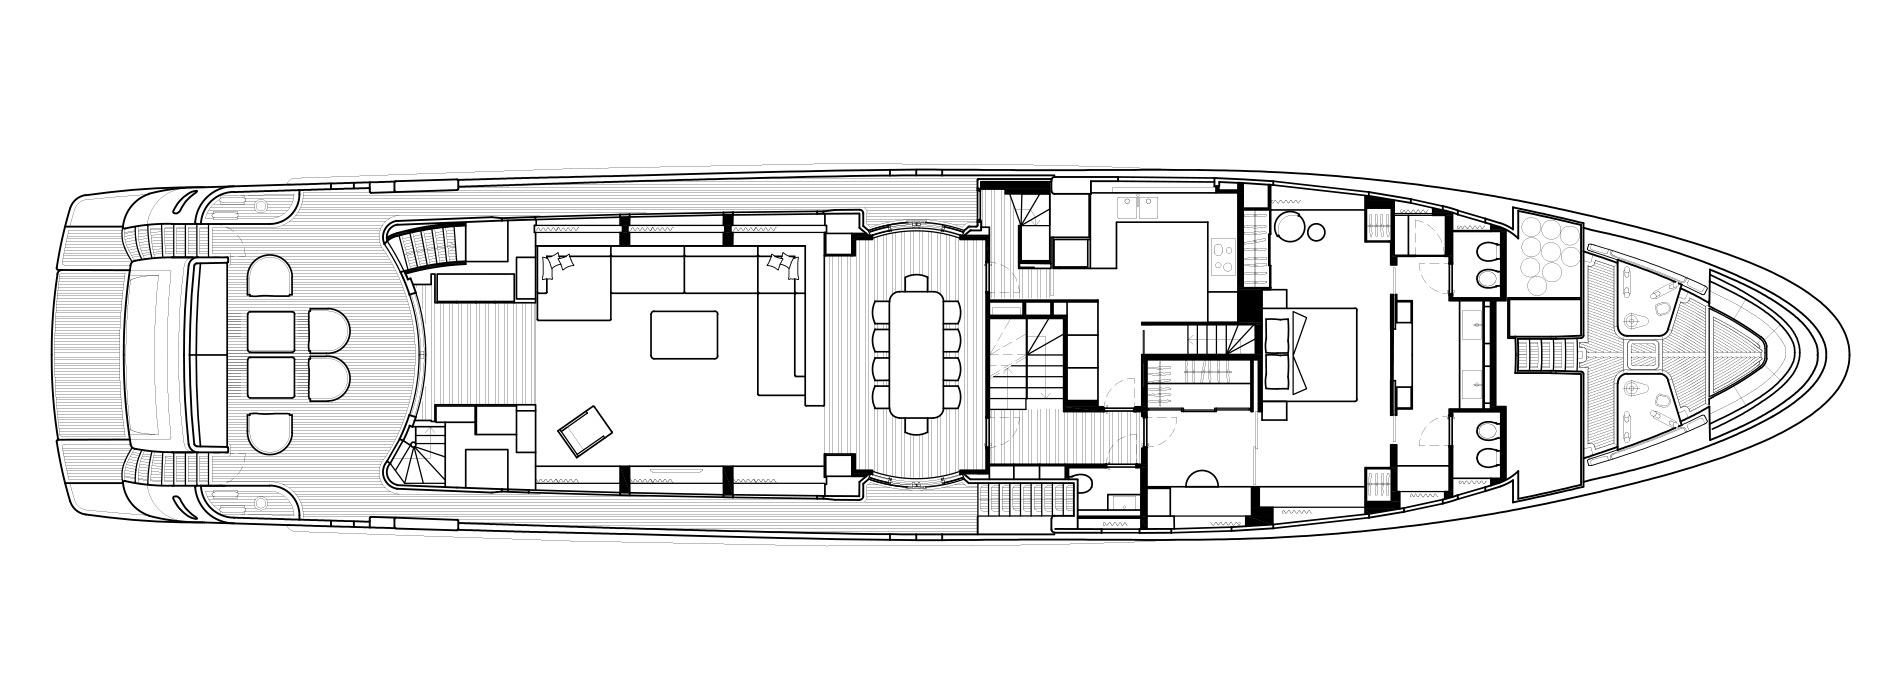 Sanlorenzo Yachts SD126 Главная палуба версия A